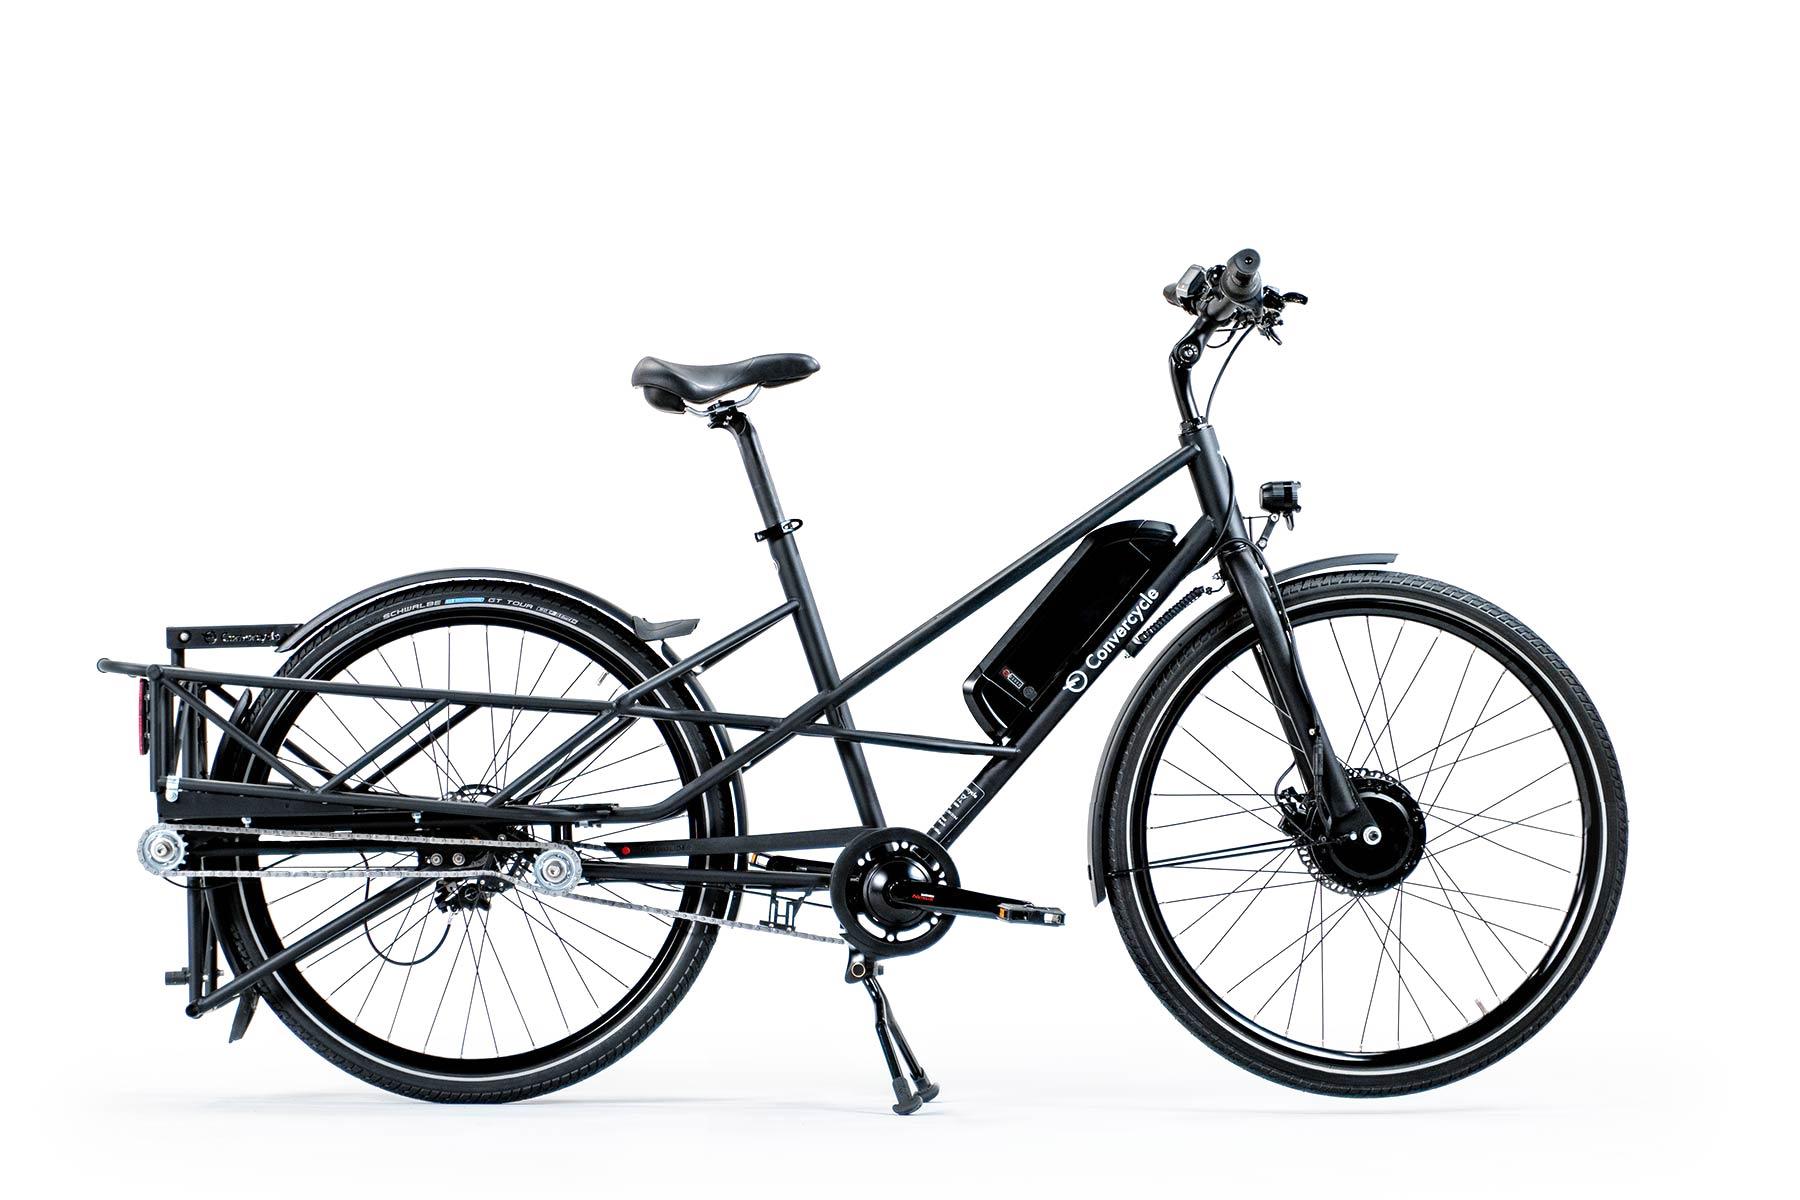 Convercycle Bike als E-City - eBikeNews